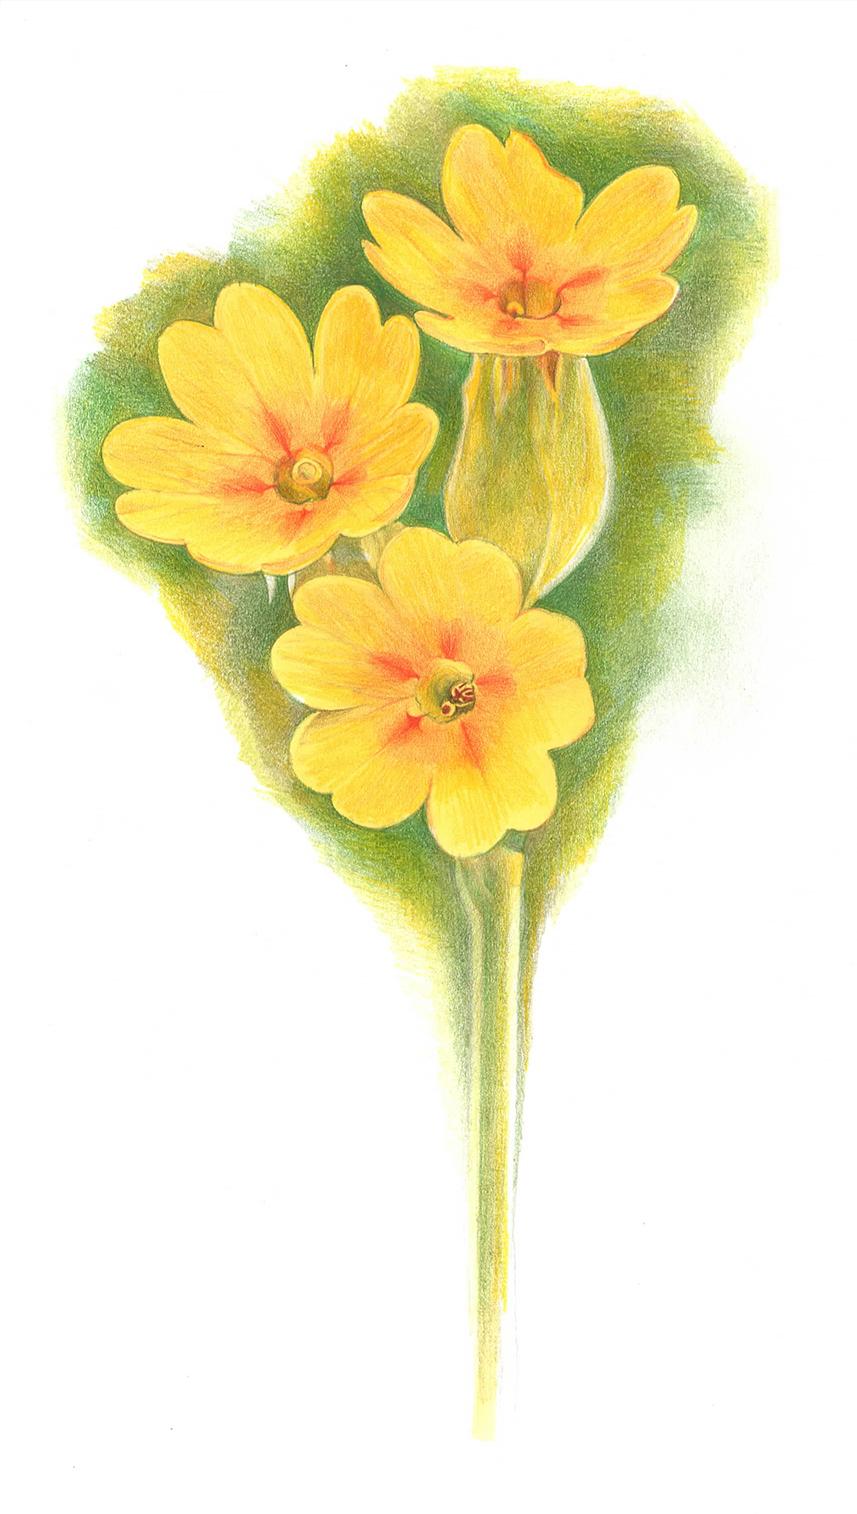 fiore-disegno-lowres.jpg